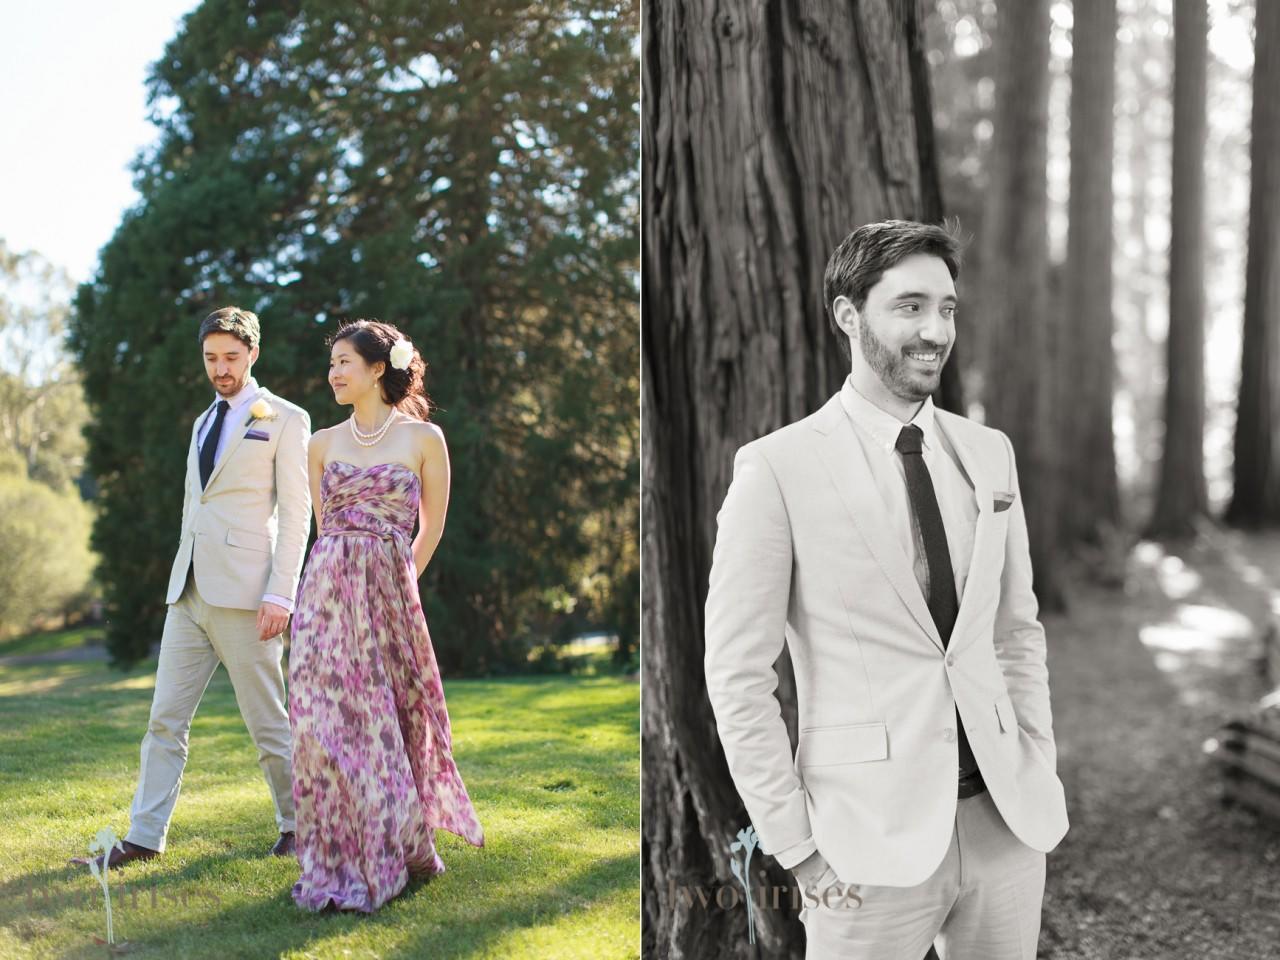 Brazilian Room Wedding Photos by Two Irises